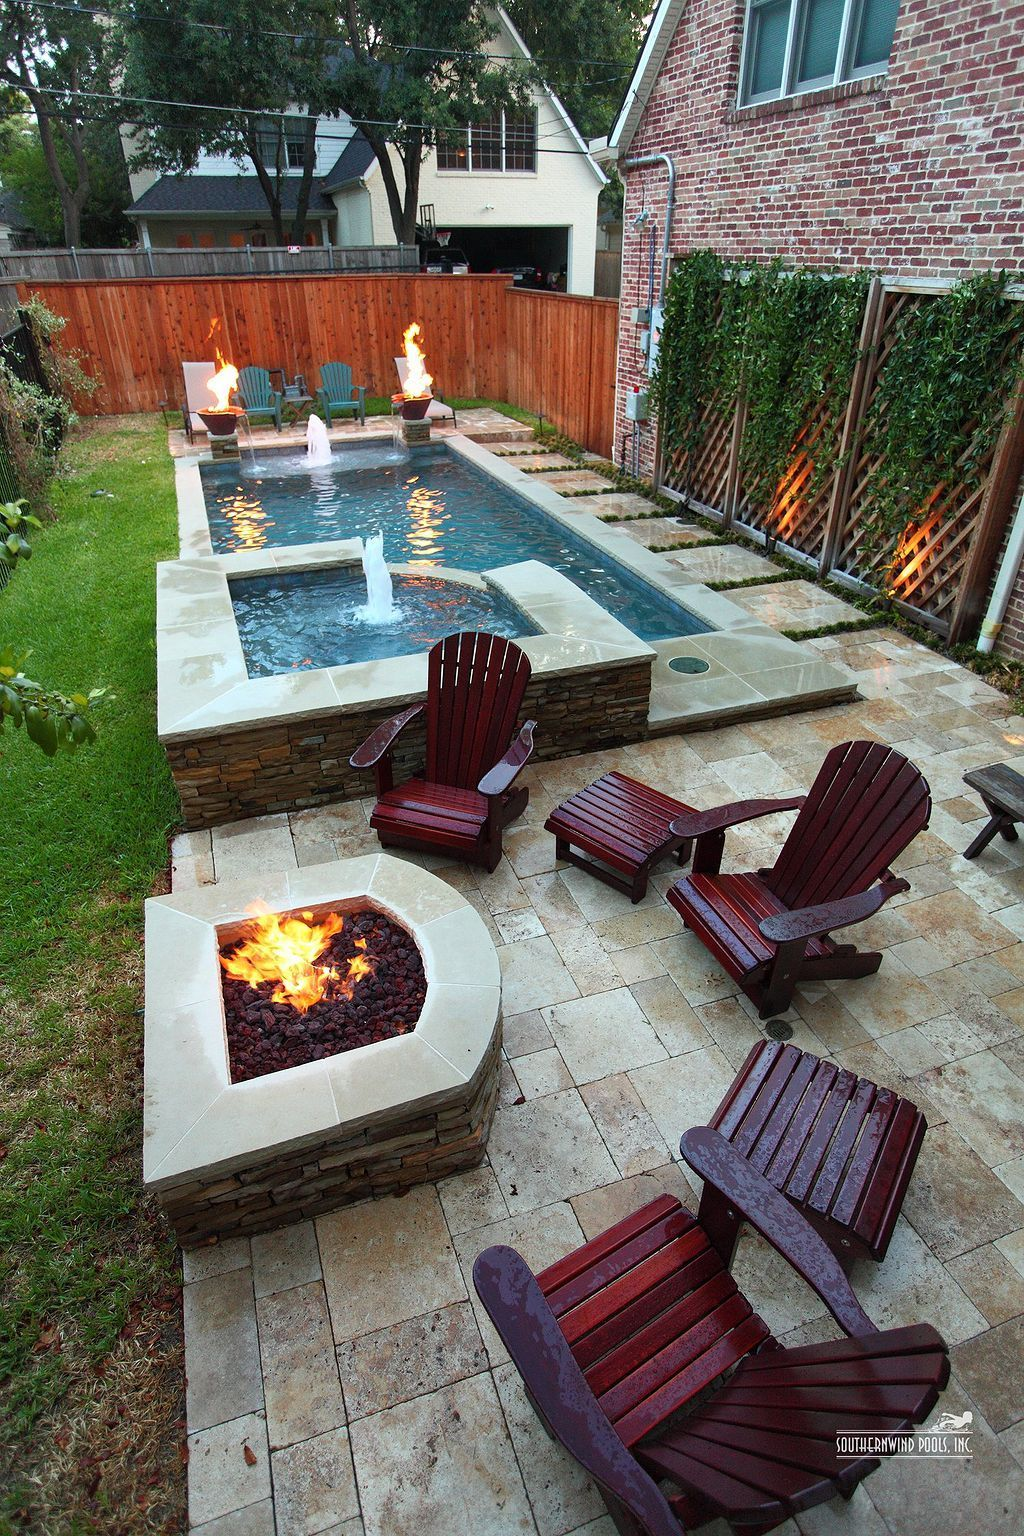 Stunning 125 Small Backyard Landscaping Ideas https://architecturemagz.com/125-small-backyard-landscaping-ideas/